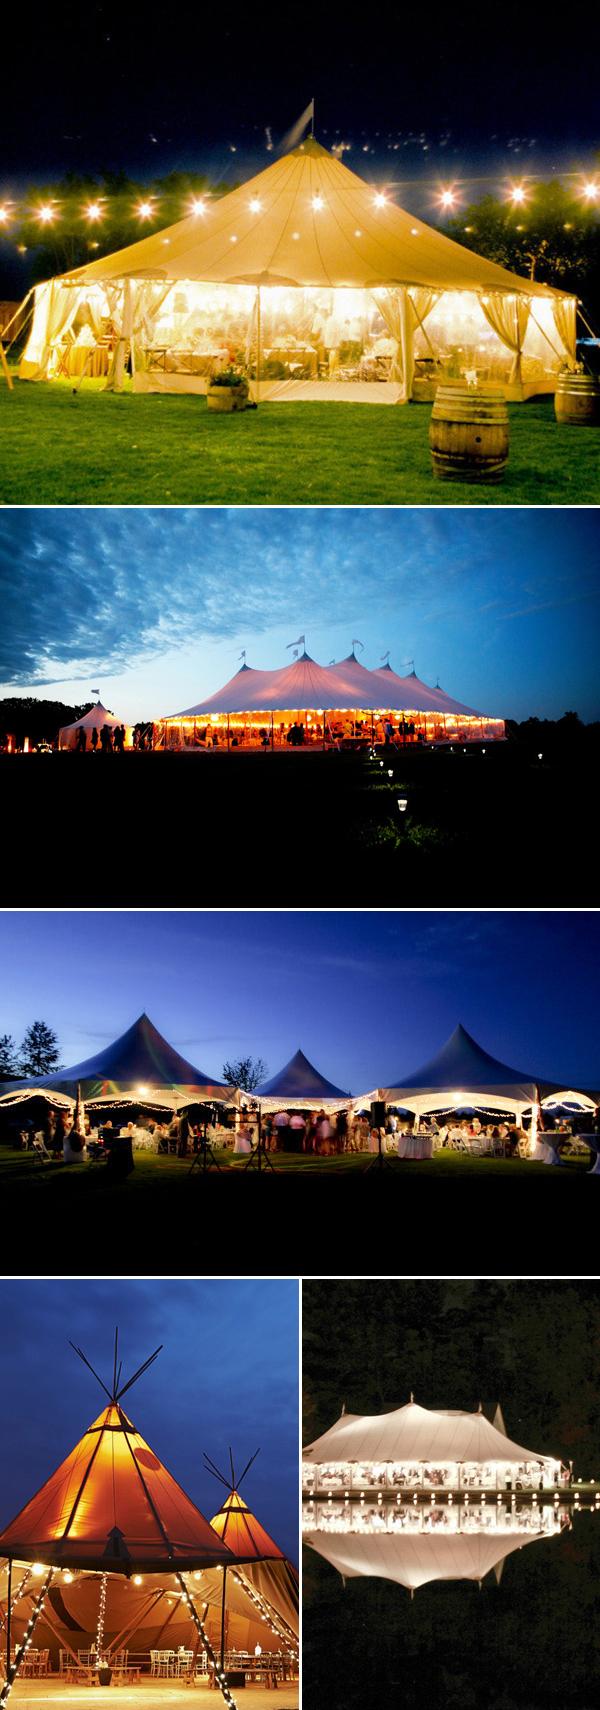 tent02-night